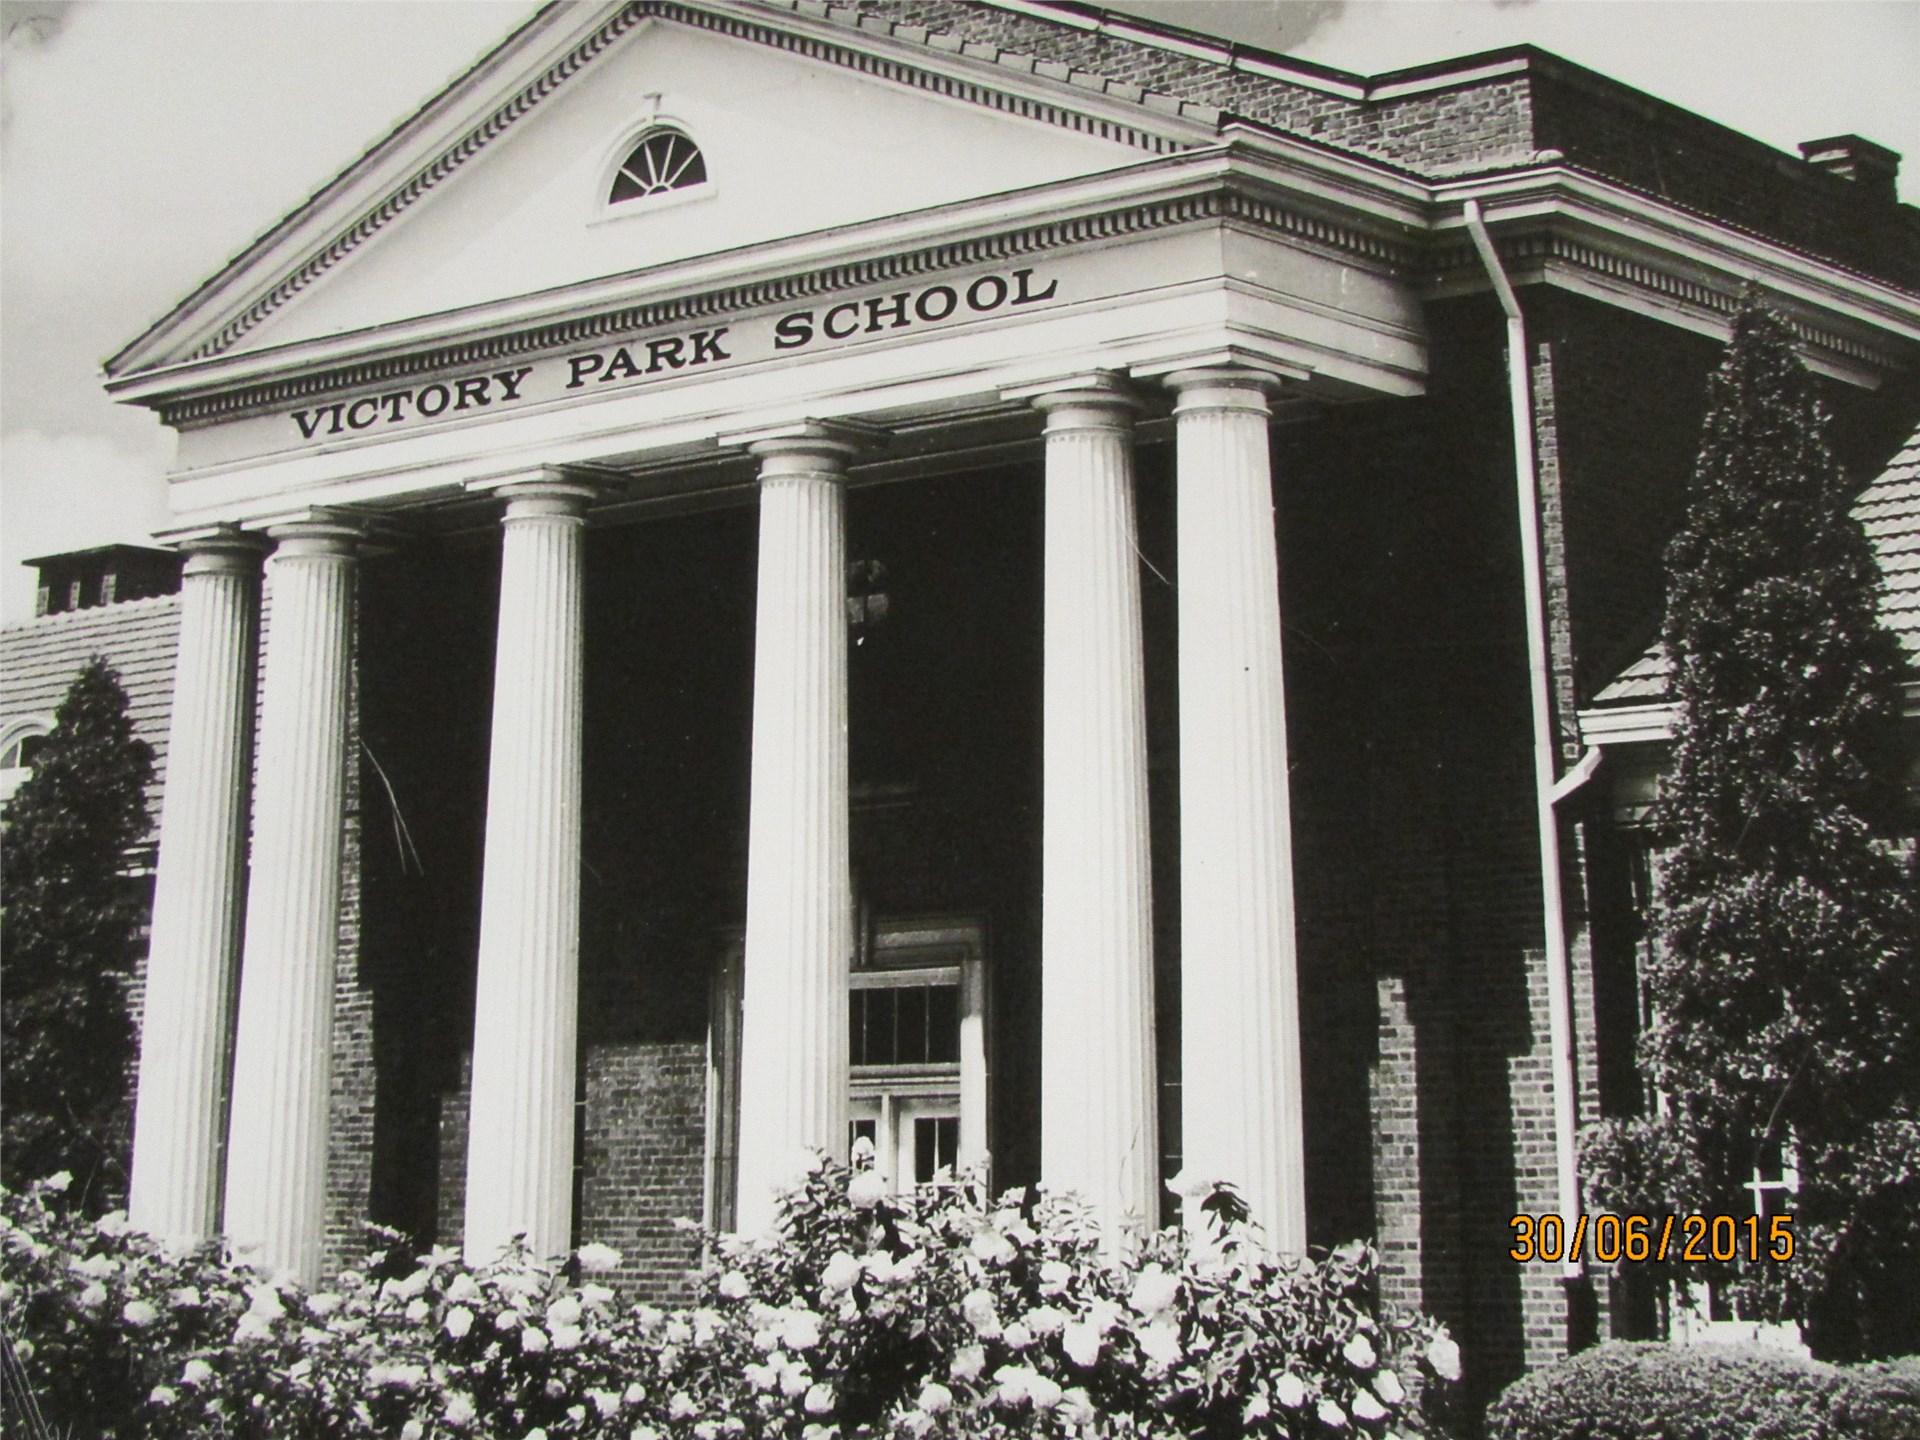 Victory Park Elementary School